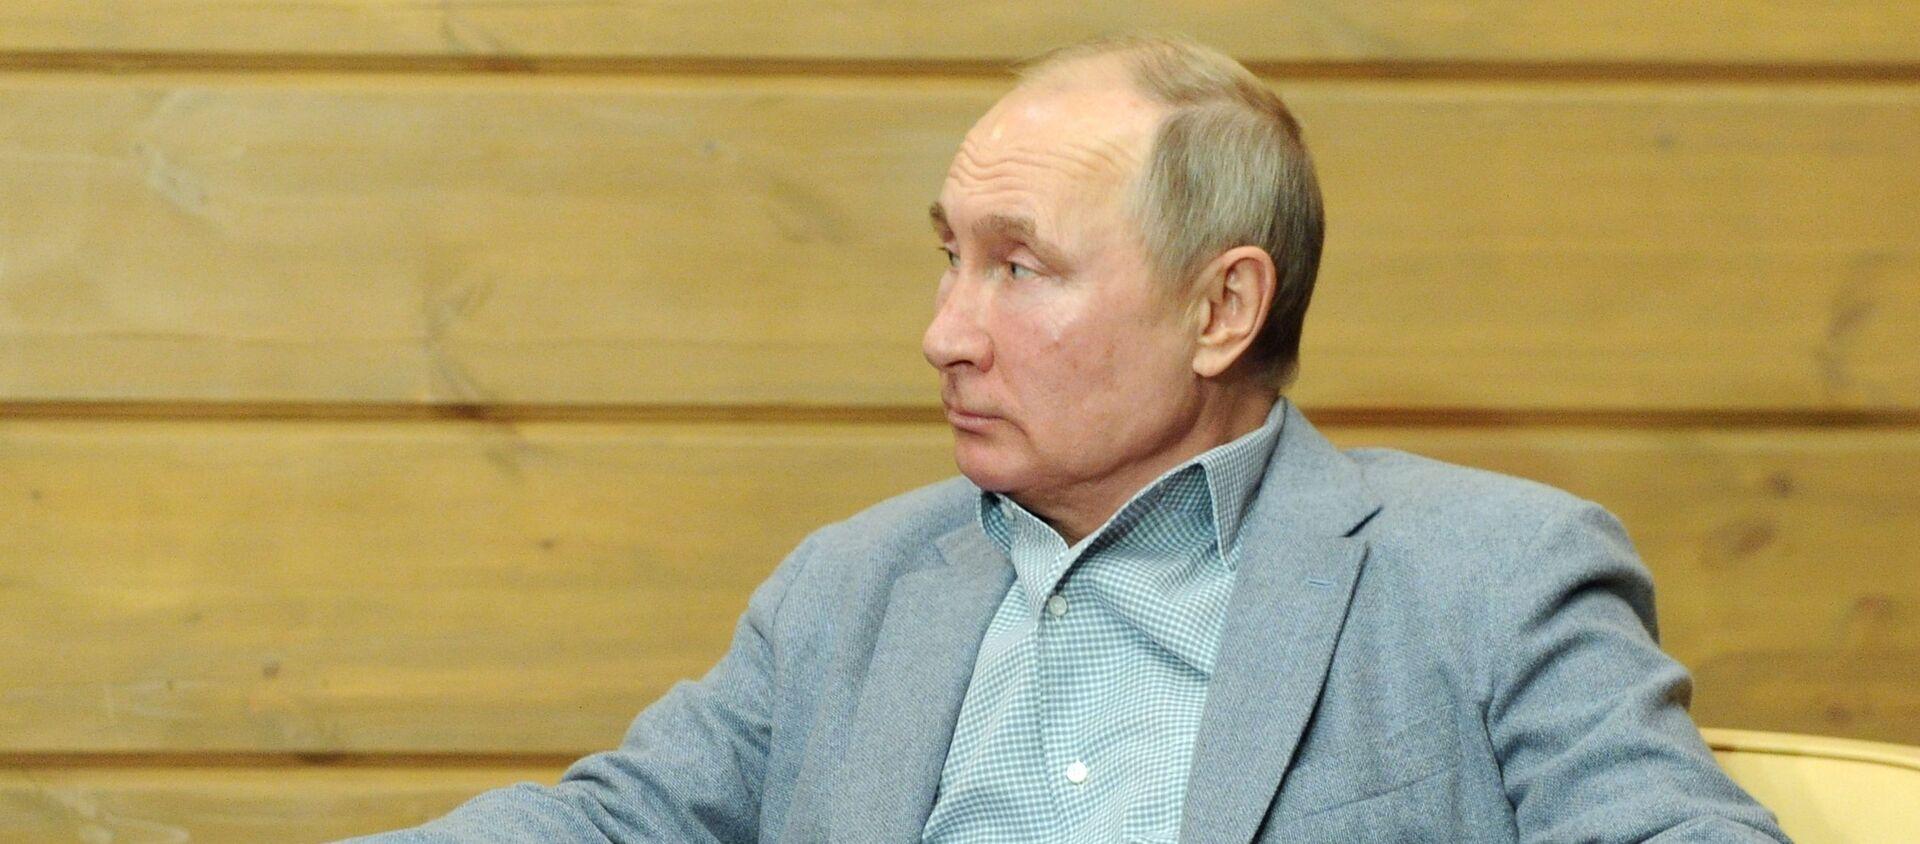 Президент РФ В. Путин встретился с президентом Белоруссии А. Лукашенко - Sputnik Беларусь, 1920, 24.02.2021